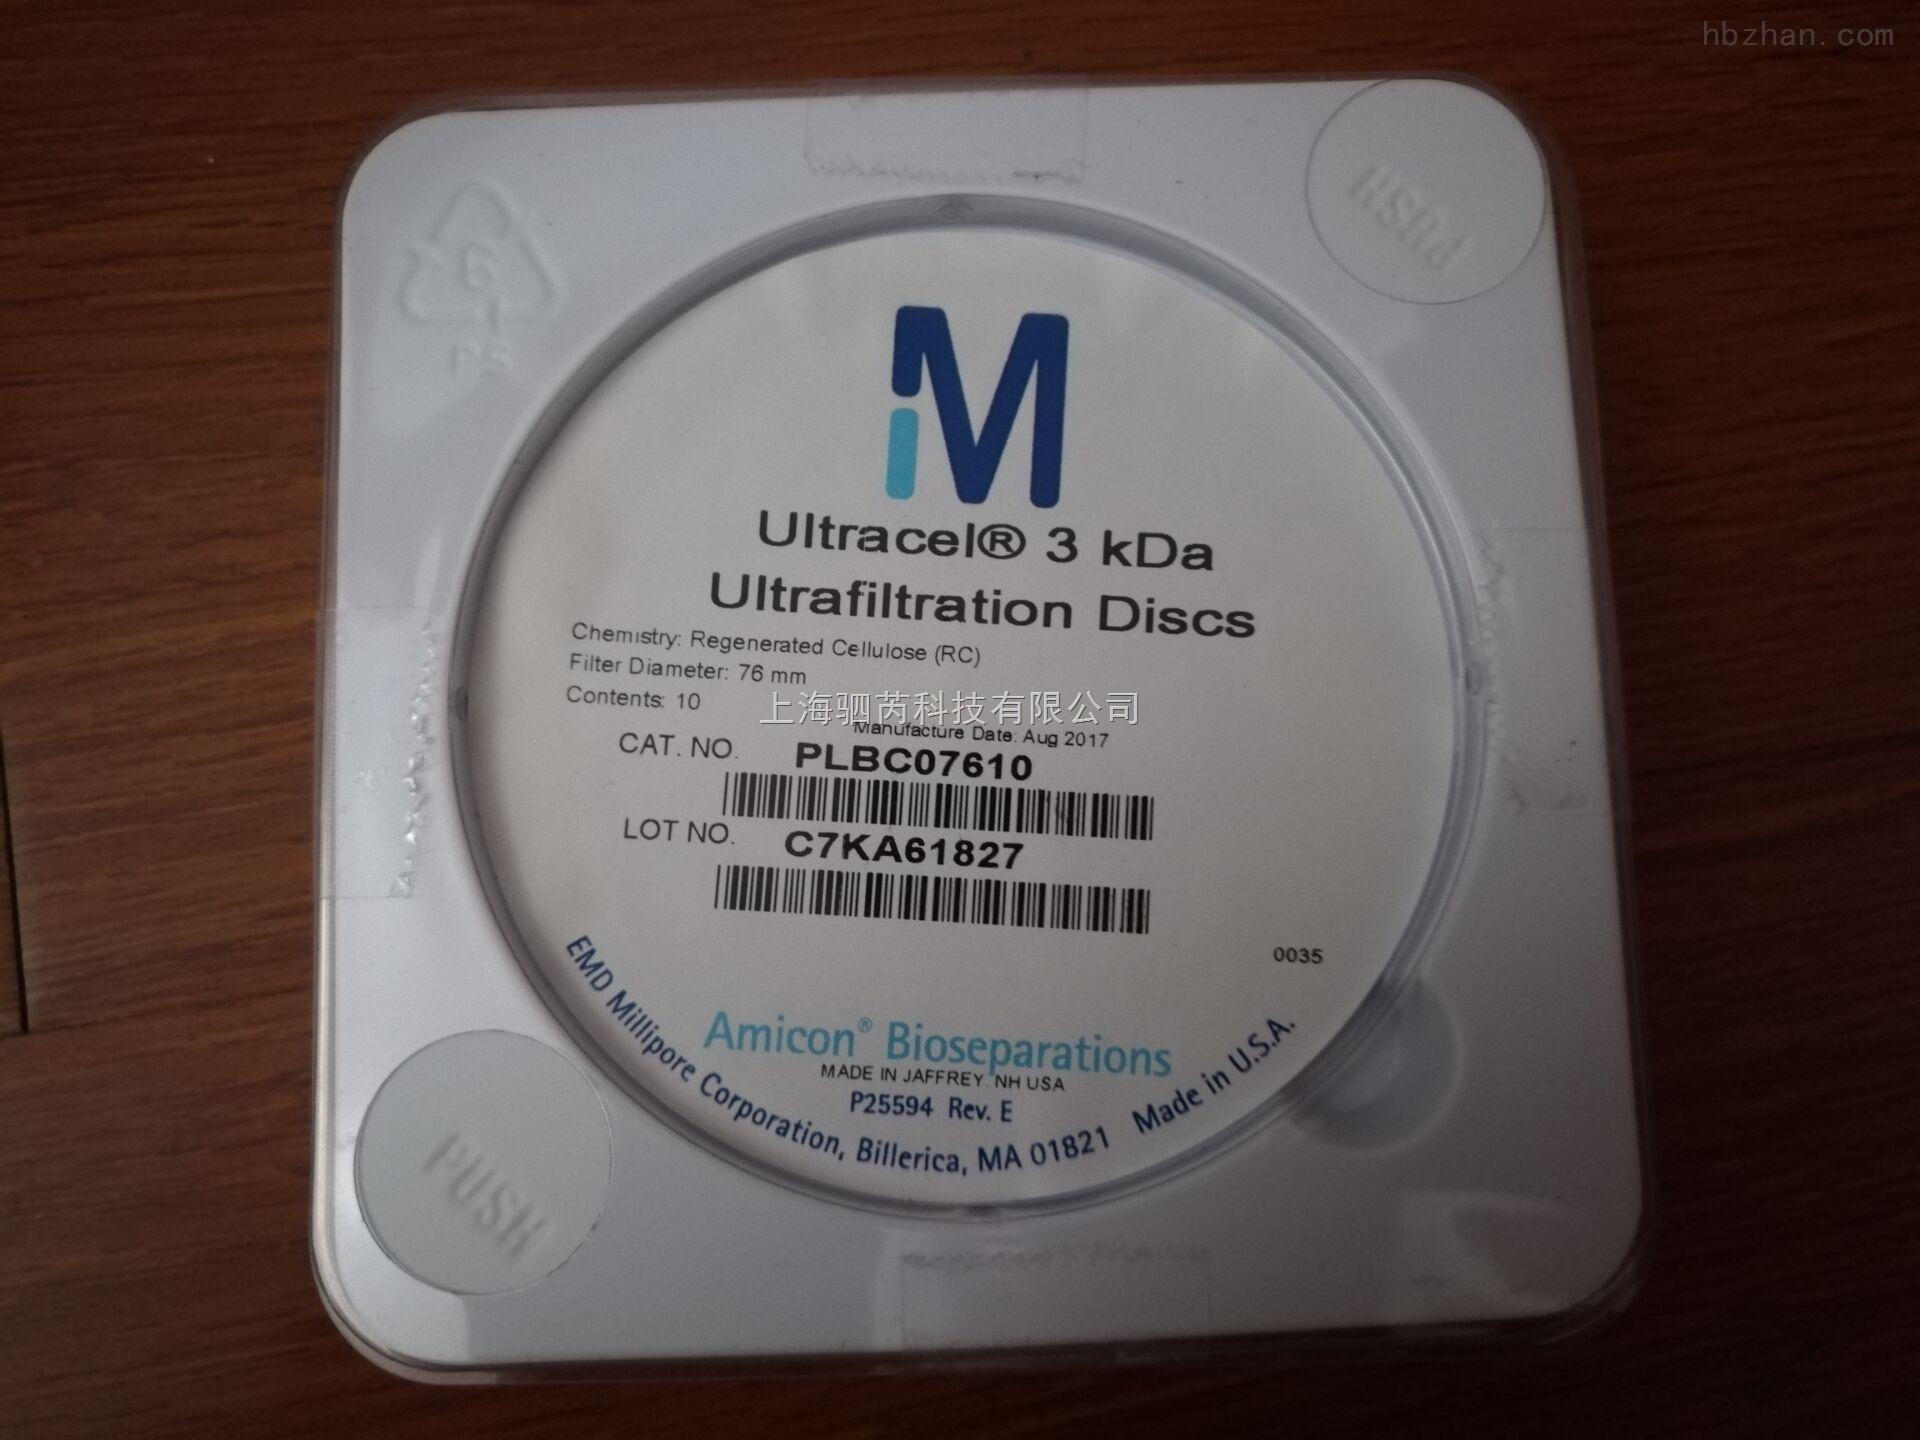 Millipore3K超滤膜PLBC07610